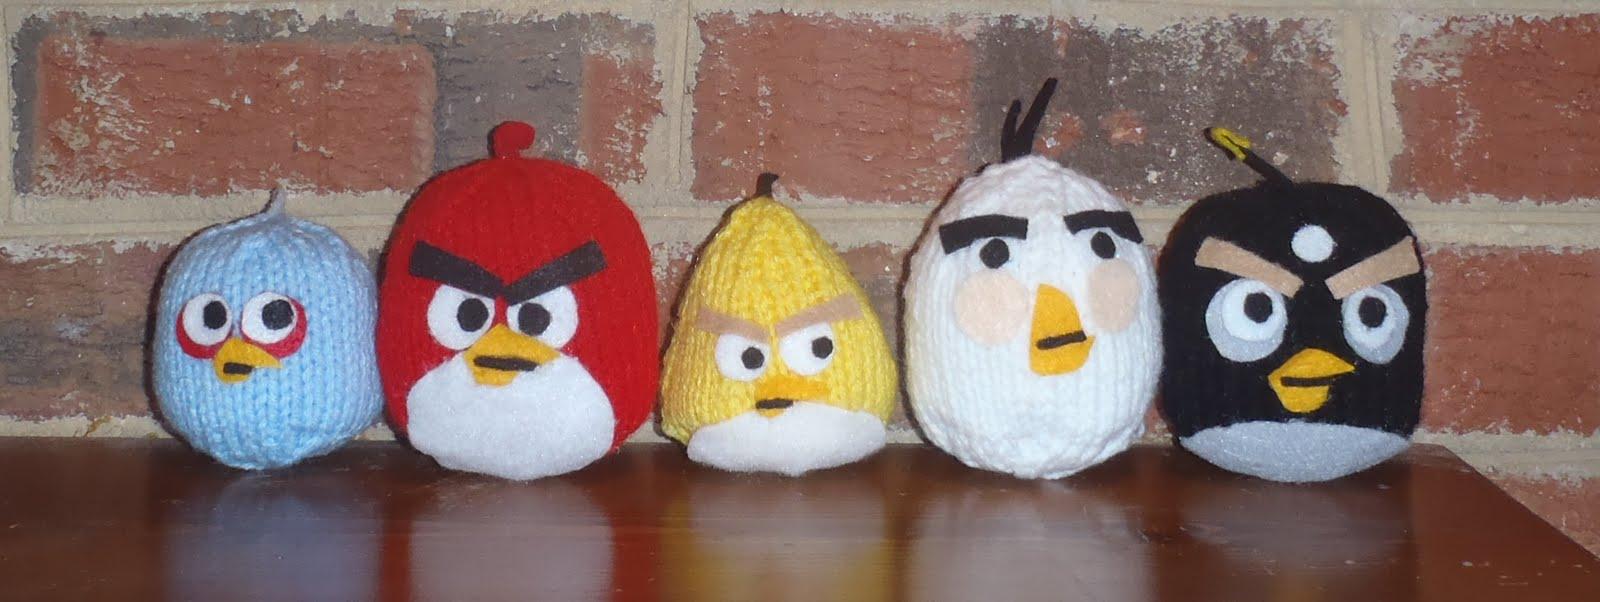 Amigurumi Angry Birds Space : 302 Found